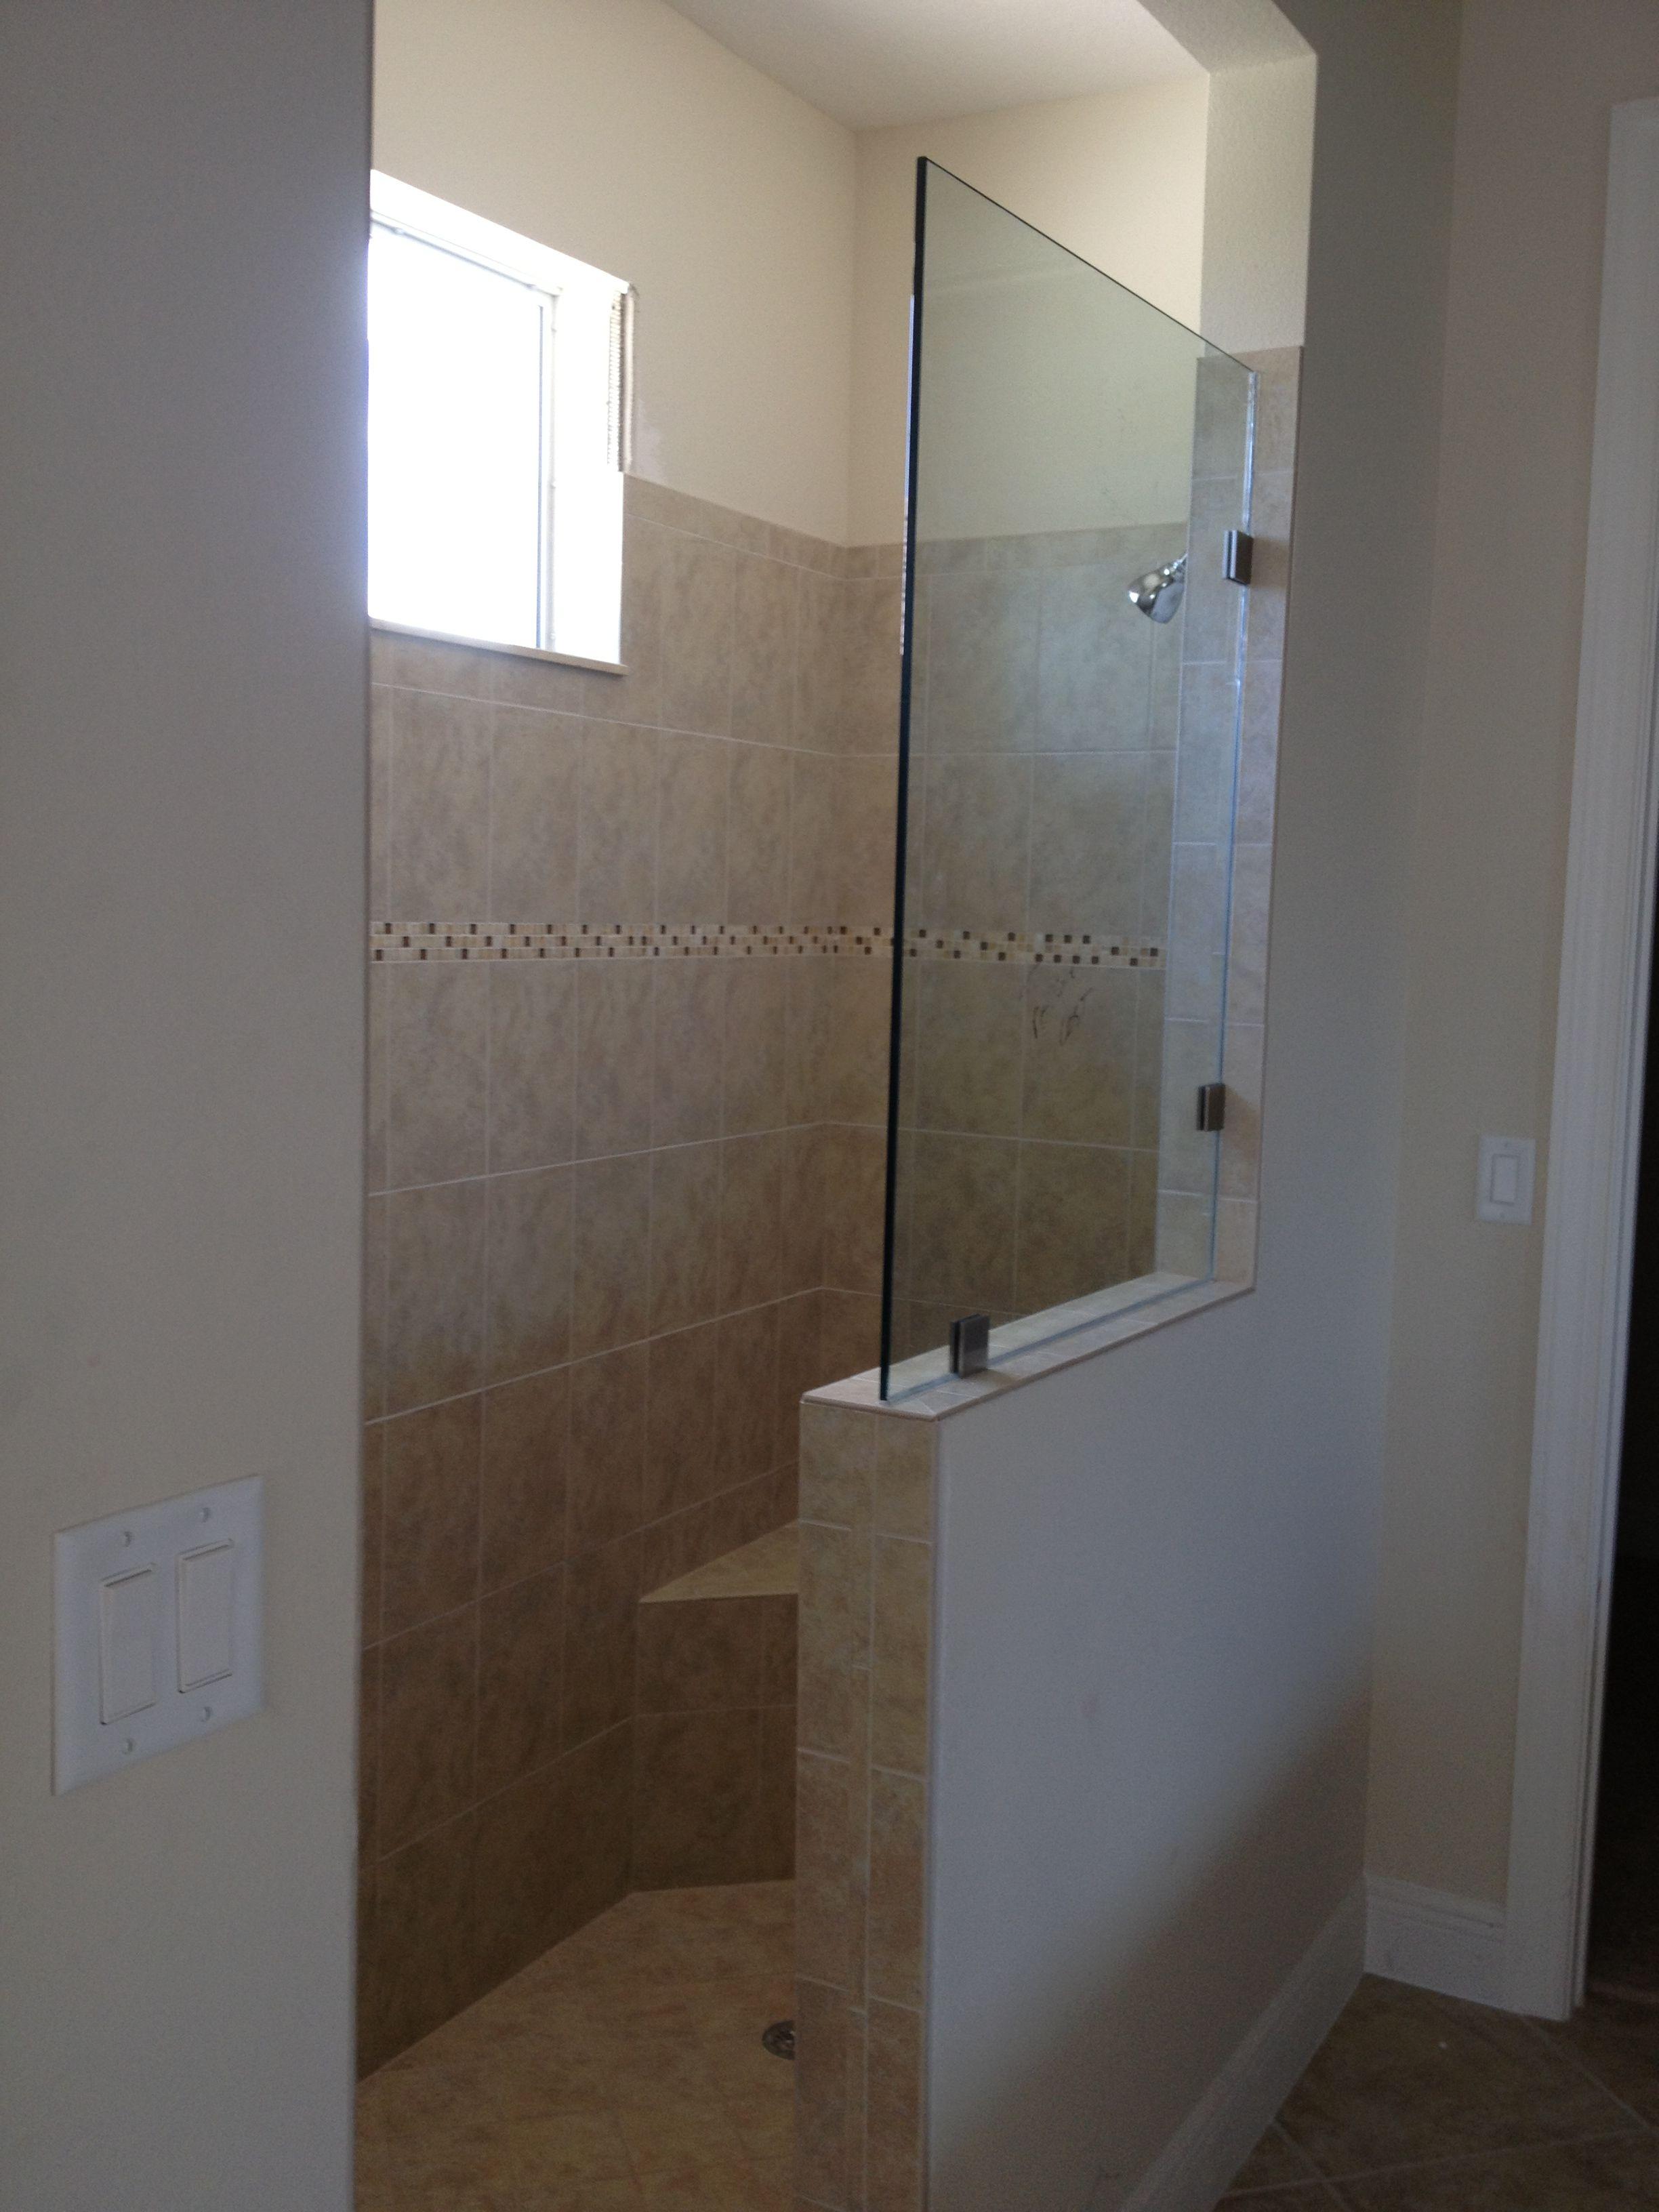 Roman shower.